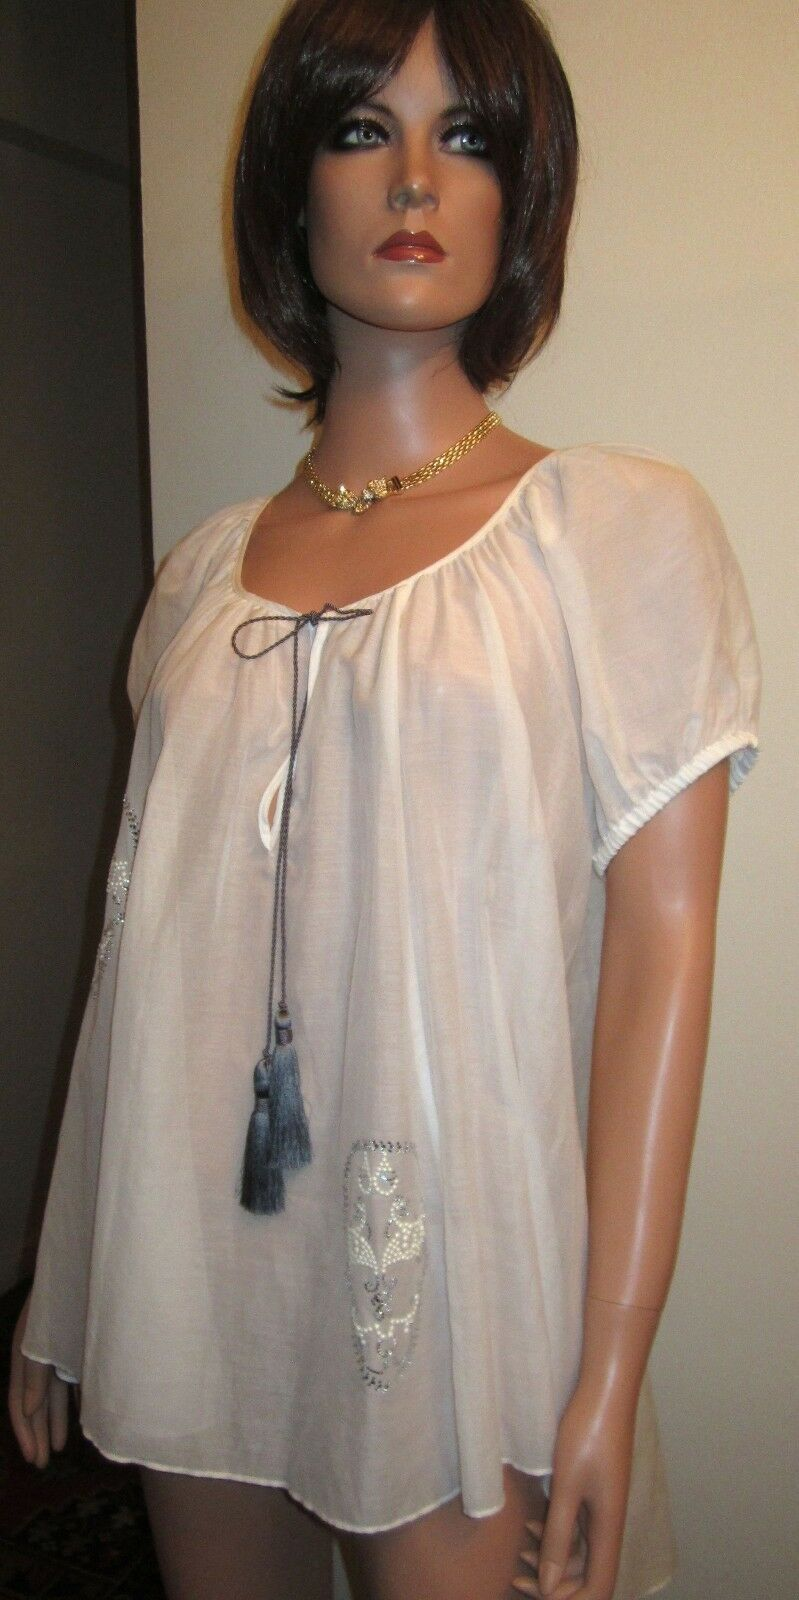 New Thomas Wylde S Hi Lo Tunic Crystal Bead Skull Cotton/Silk Weiß Peasant Top